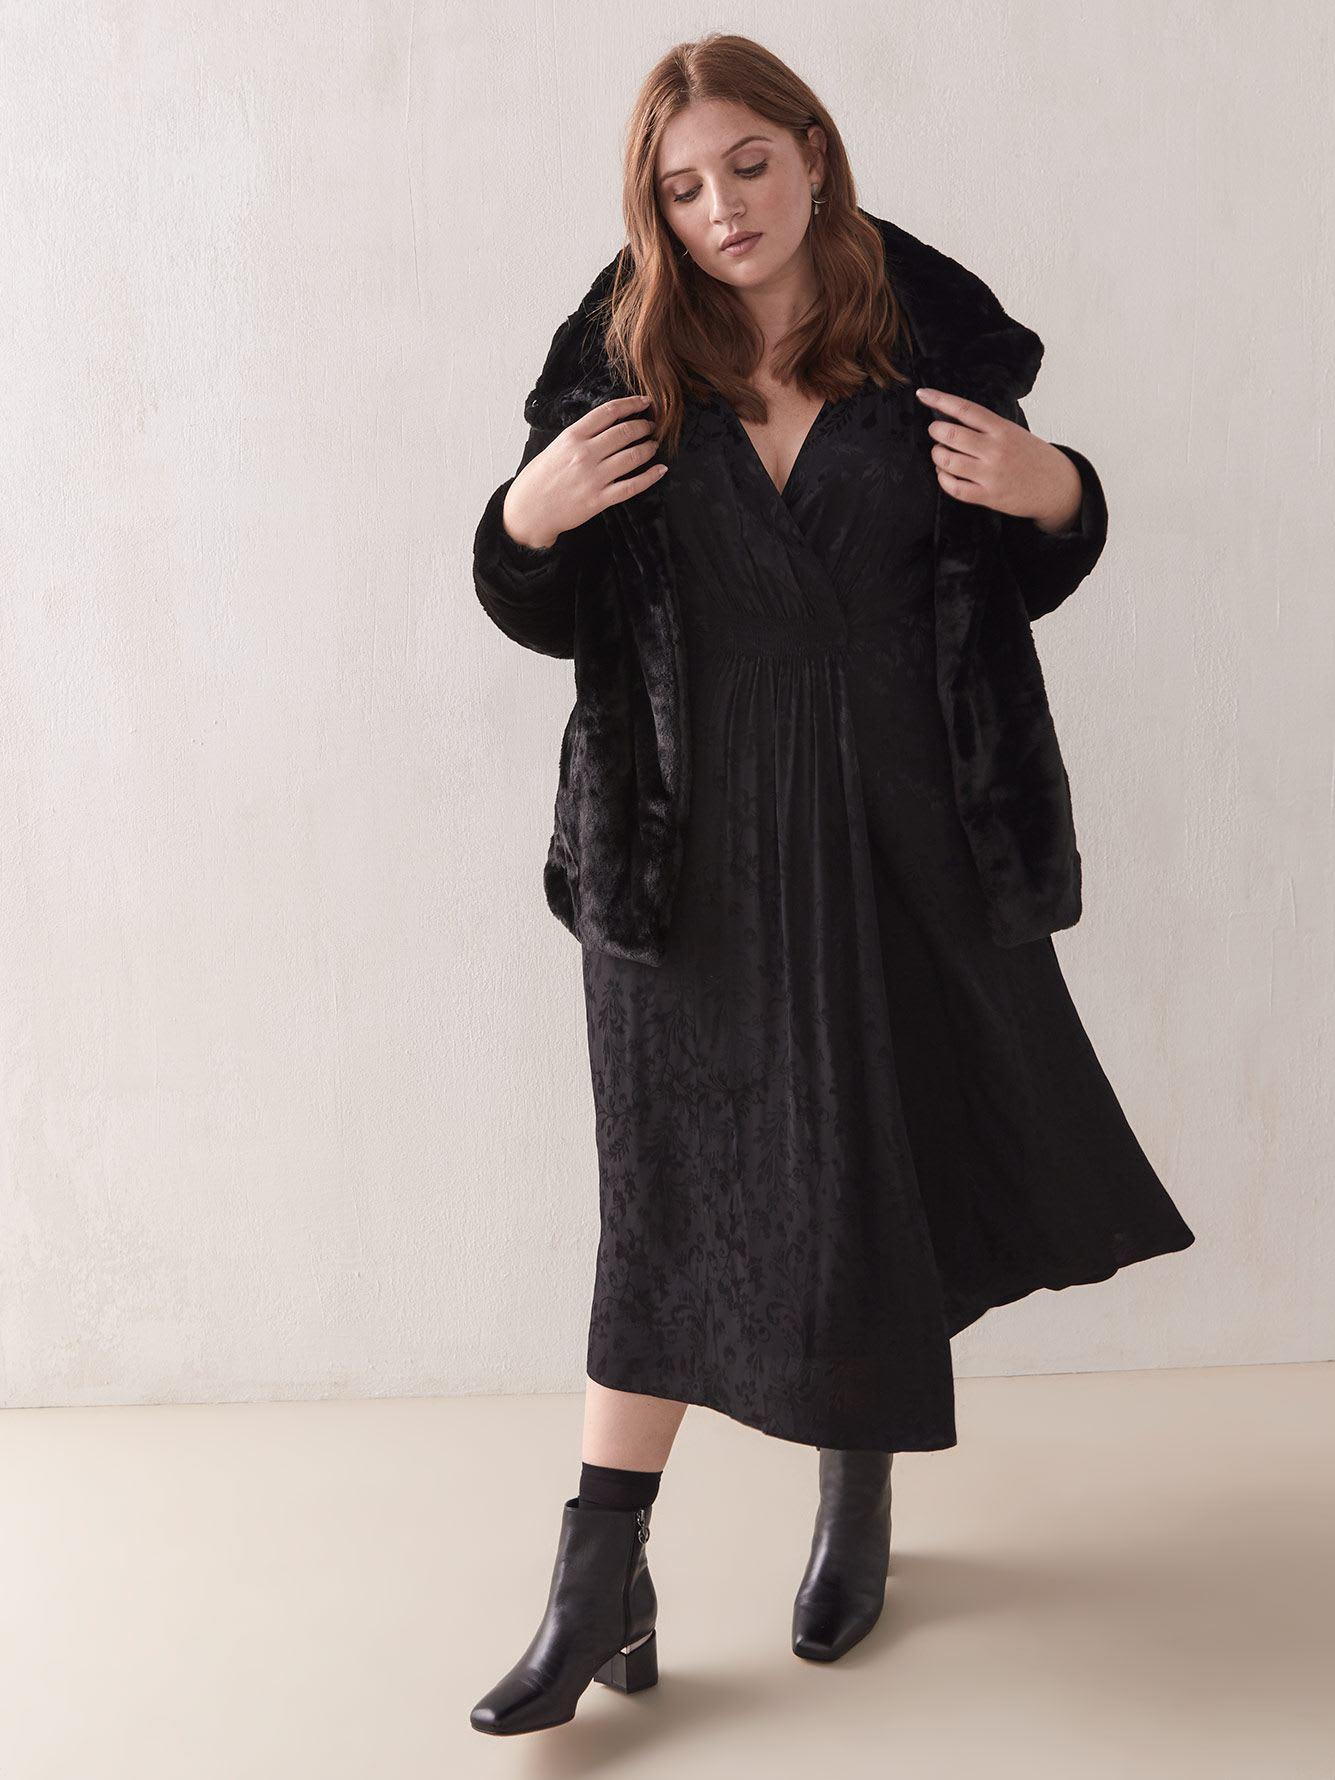 Short Faux Fur Jacket - Addition Elle